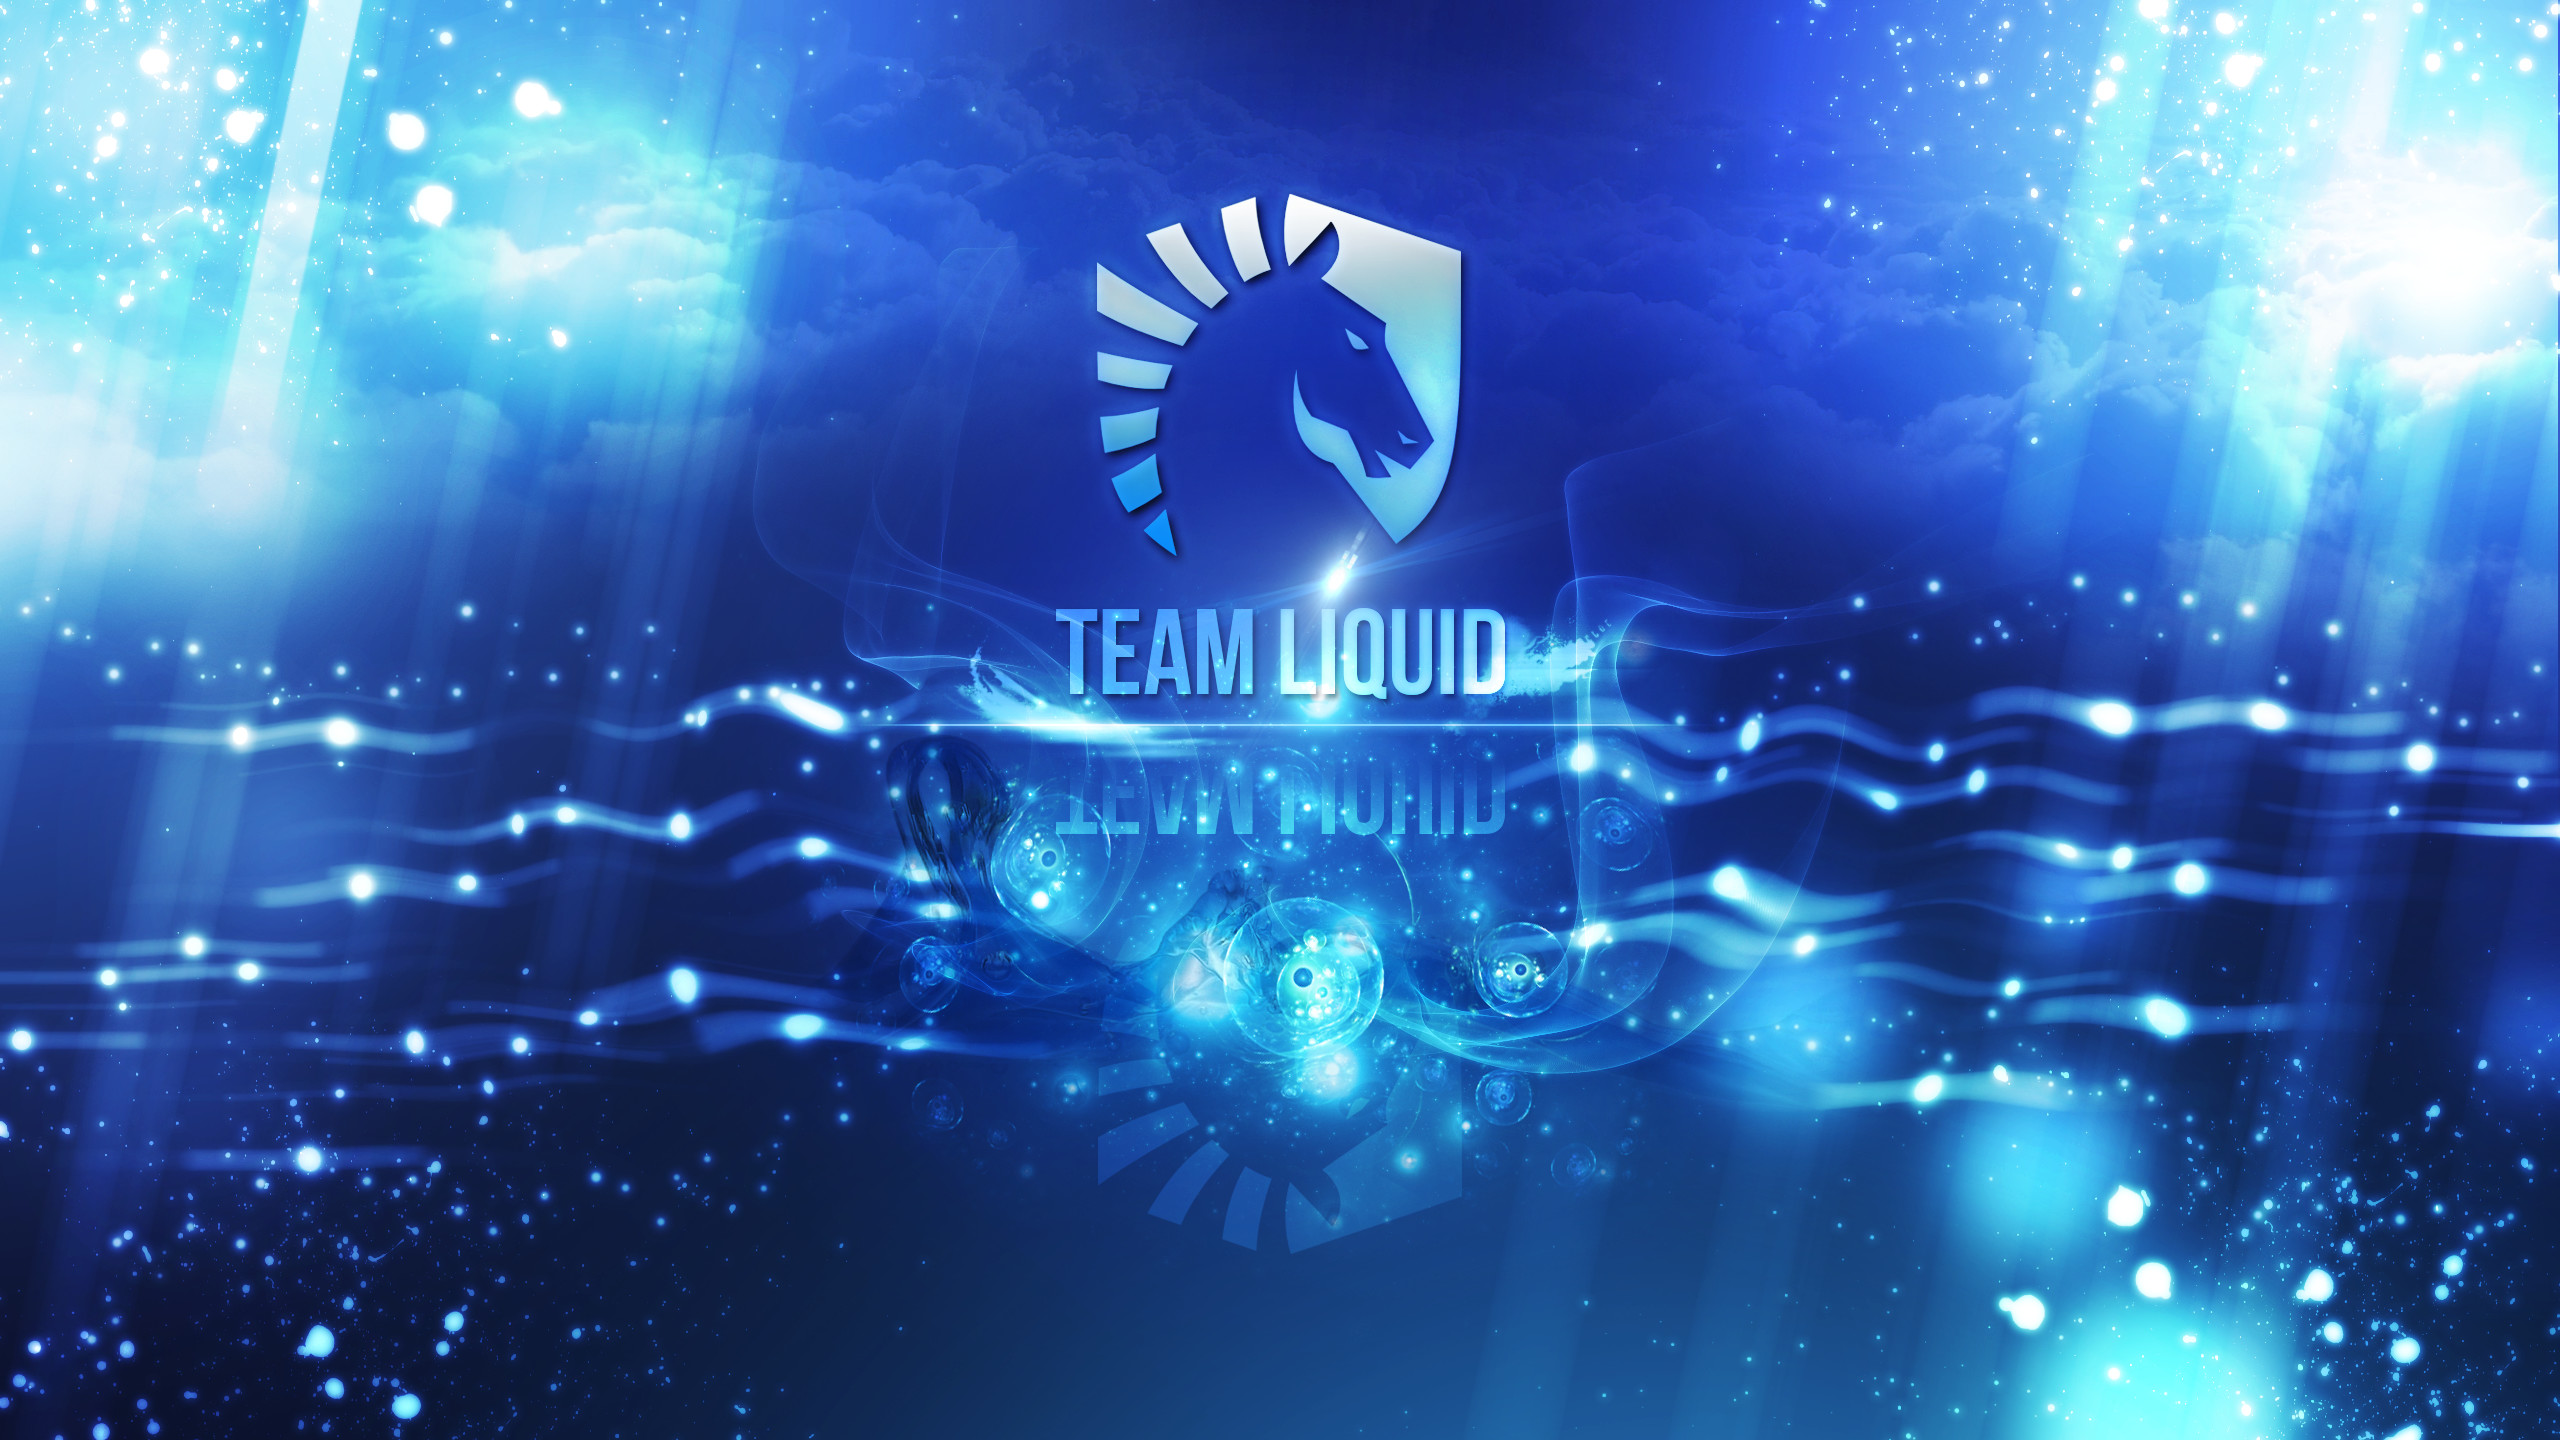 … Team Liquid Wallpaper Logo – League of Legends by Aynoe